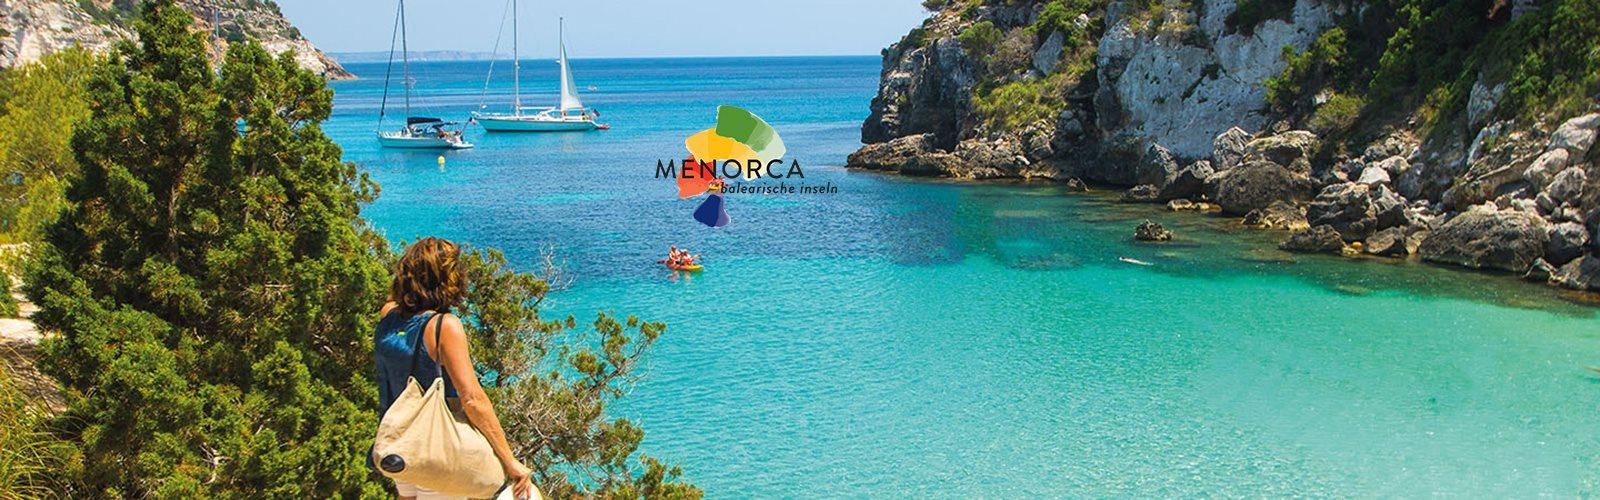 Berühmte Bucht Menorca mit türkisem Meer, grüner Natur und Selgelbooten